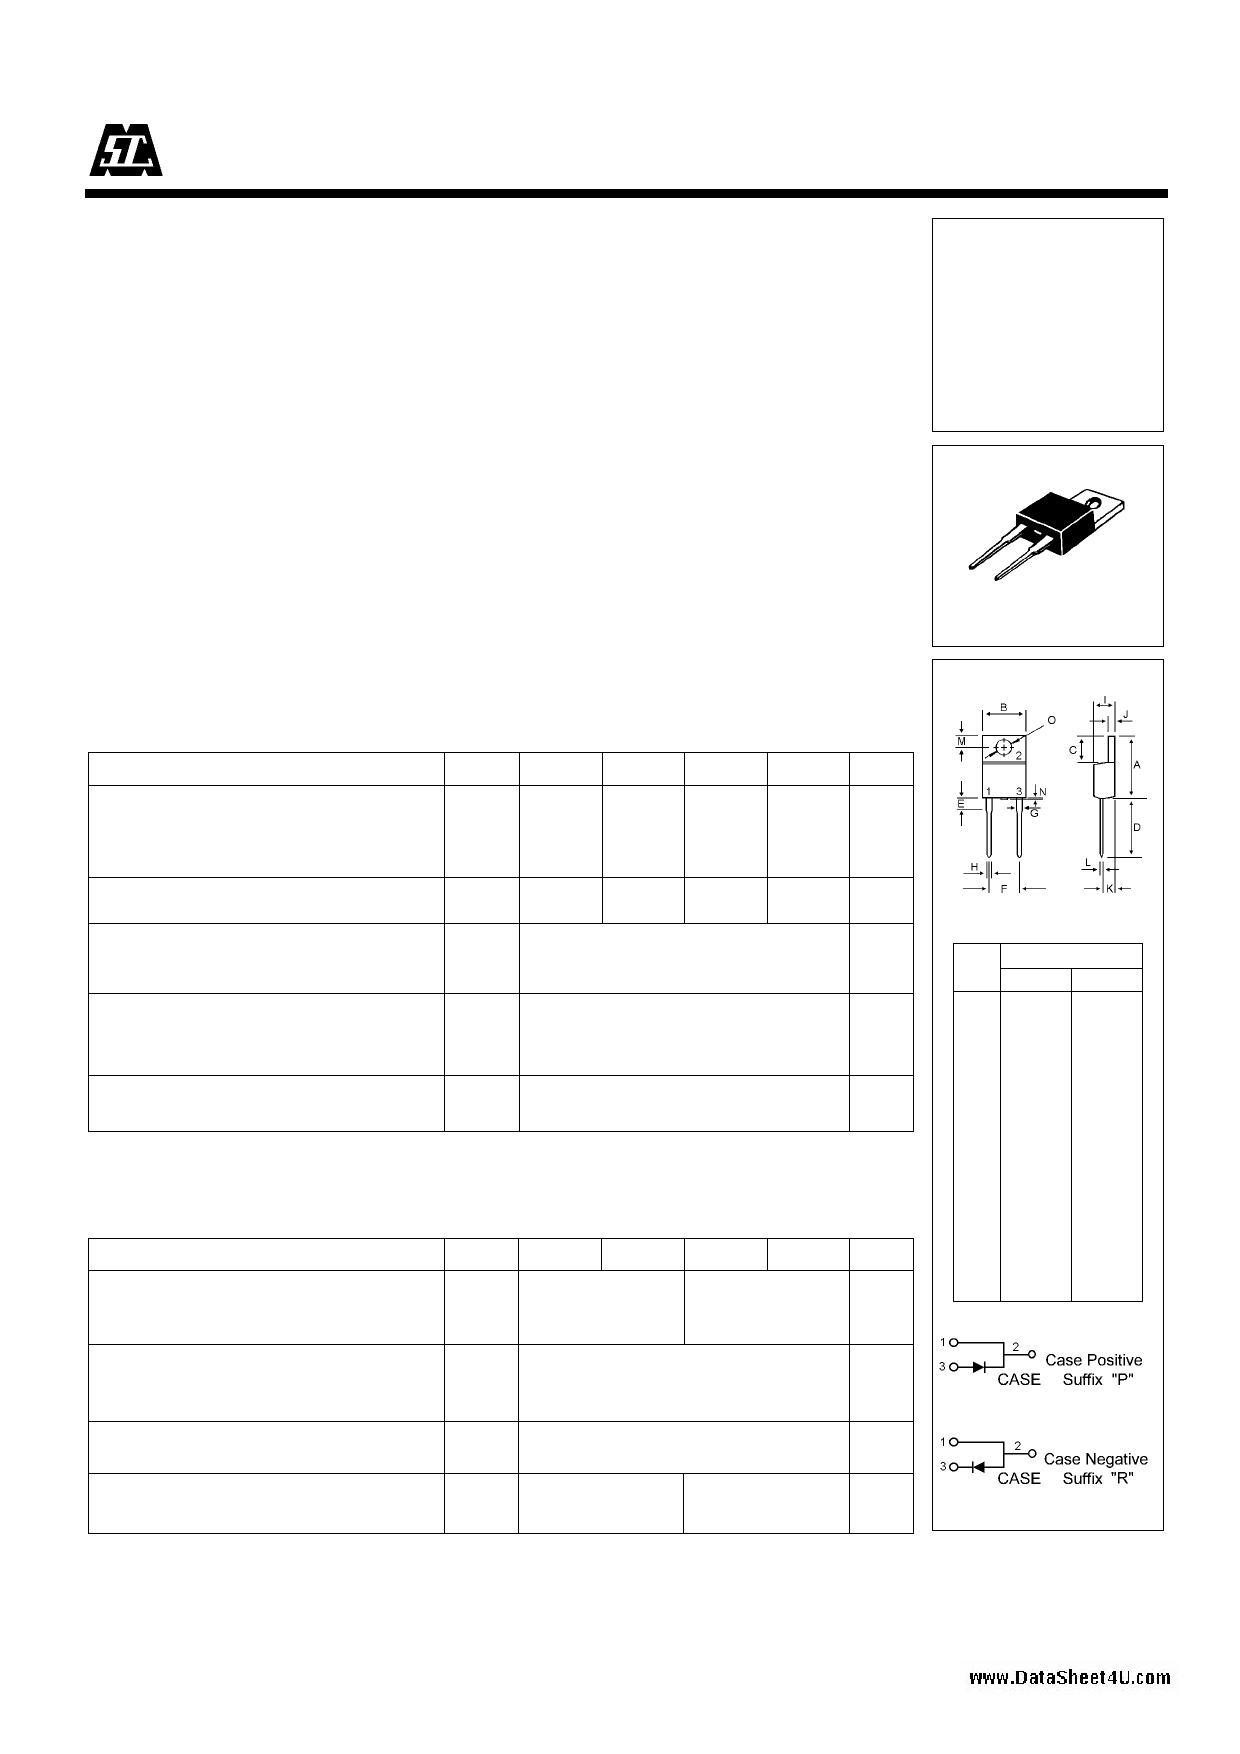 U05A60 datasheet